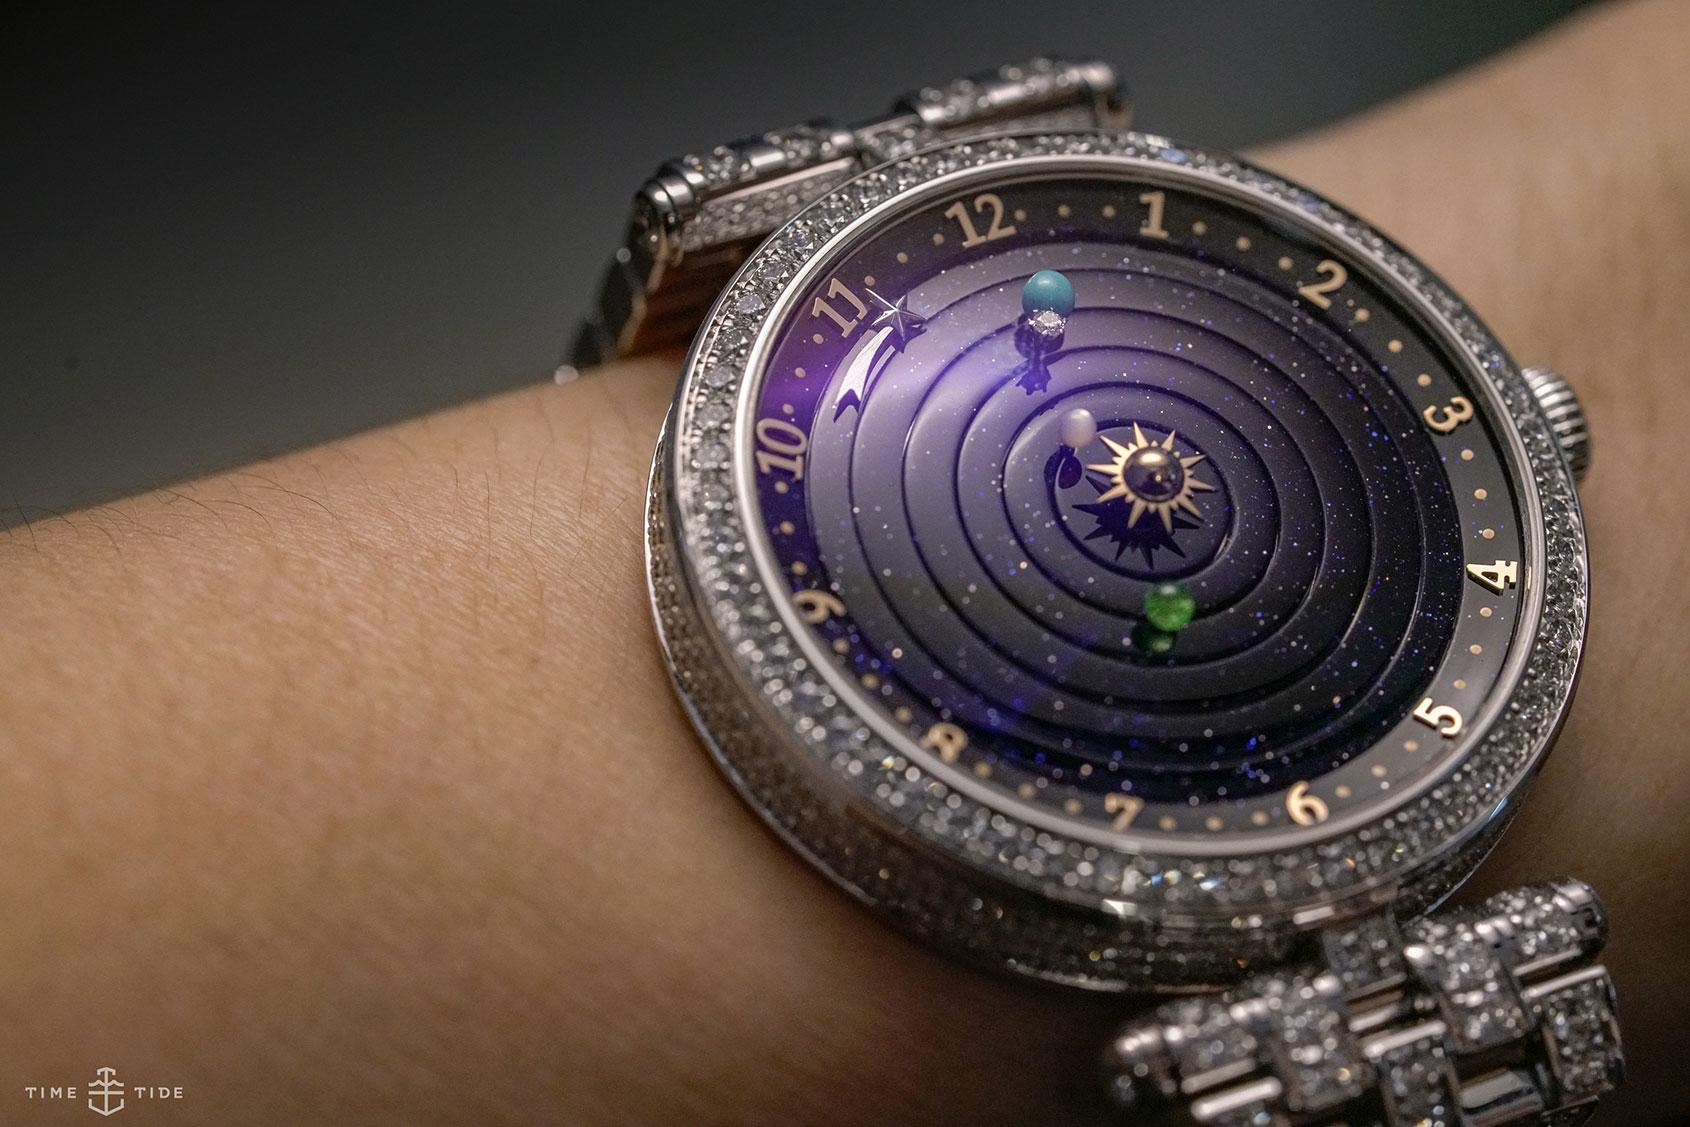 VAN CLEEF & ARPELS LADY ARPELS PLANÉTARIUM POETIC COMPLICATIONS - best watches without hands